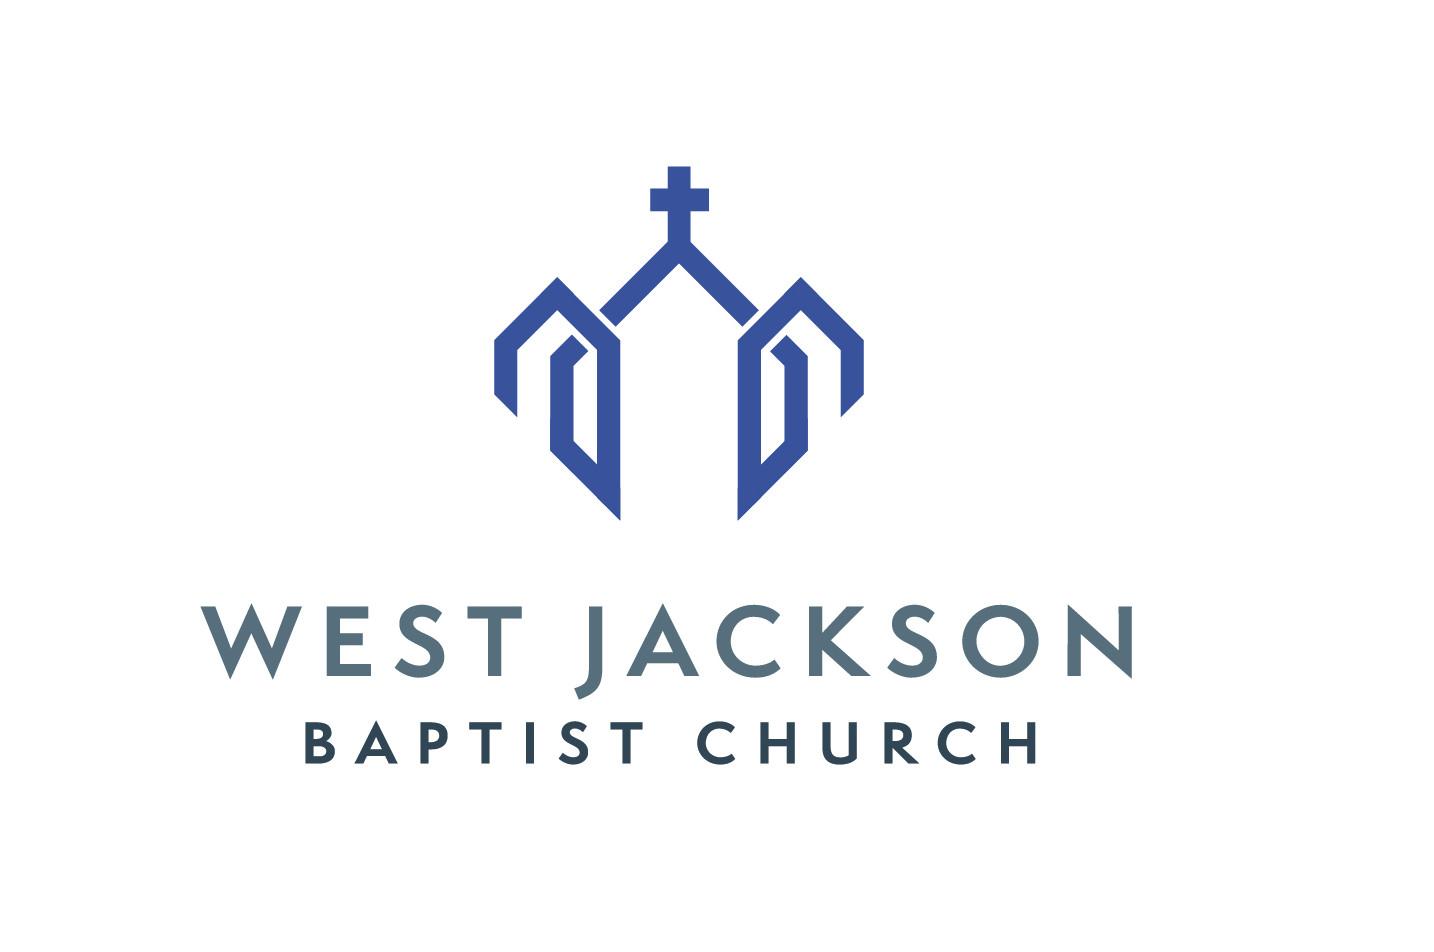 West Jackson Baptist Church - EVENT LOCATION SPONSOR